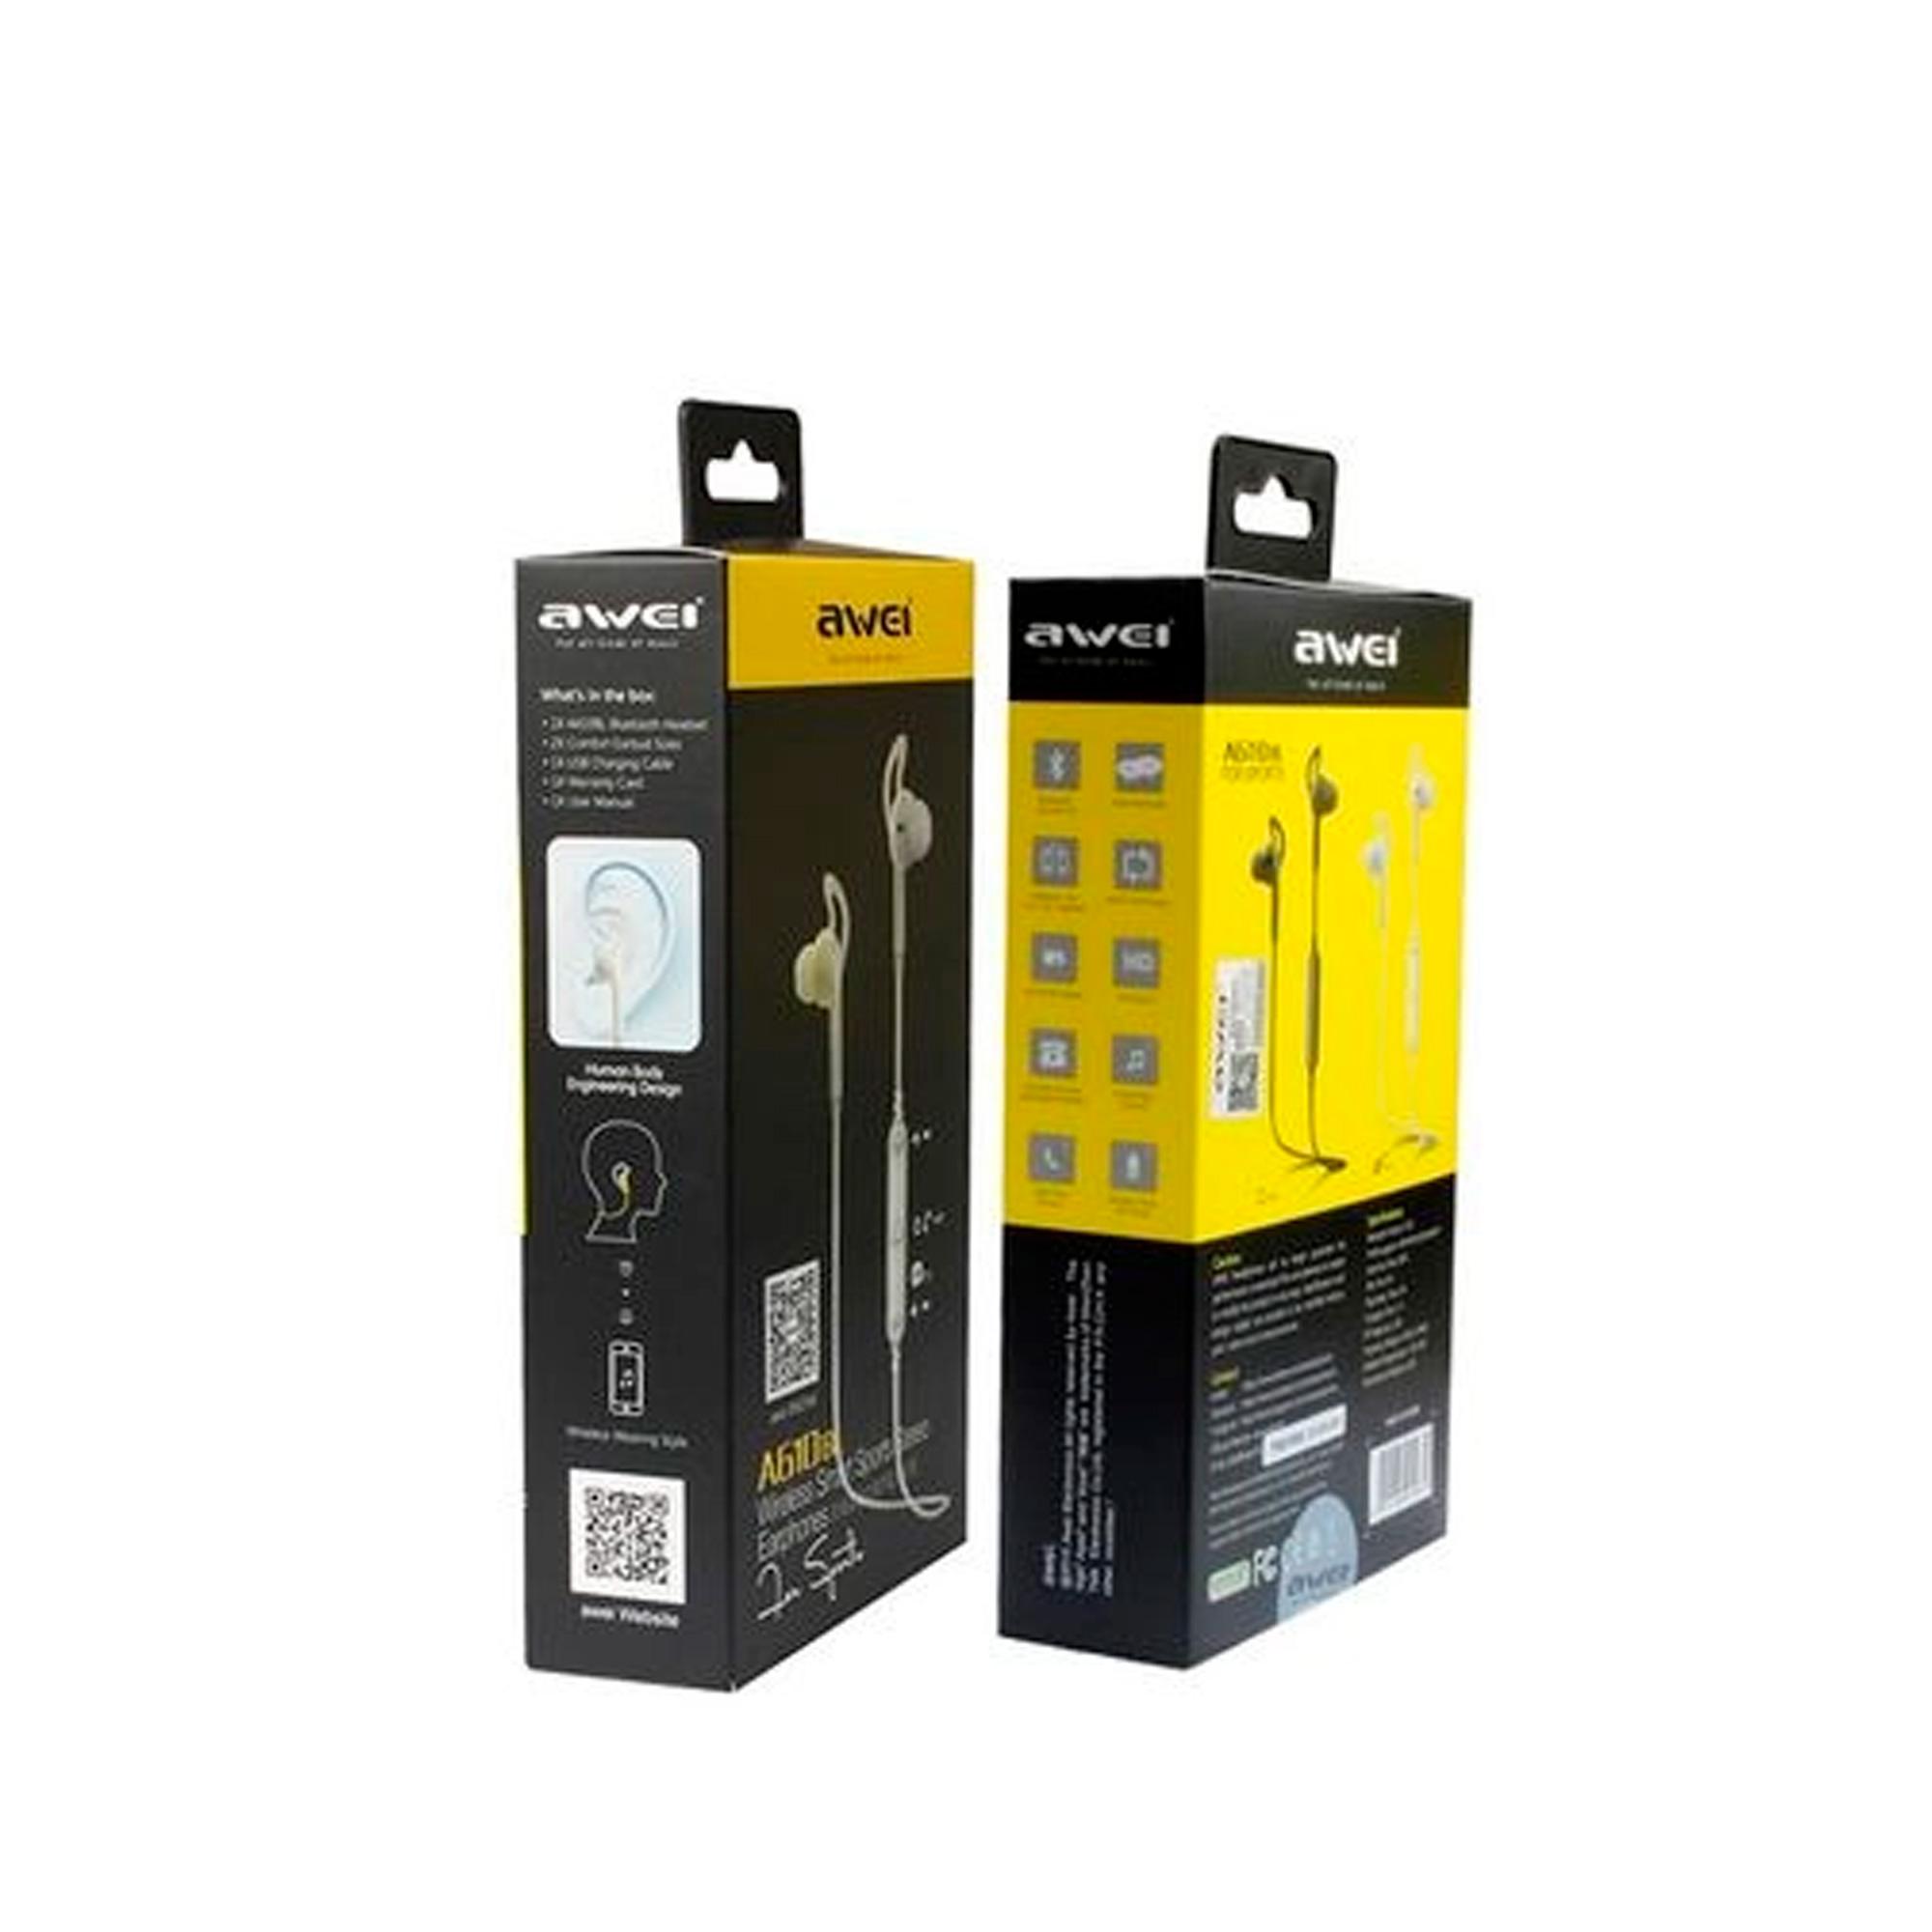 Fone de Ouvido Sem Fio Bluetooth Awei A610BL In-Ear Esportivo